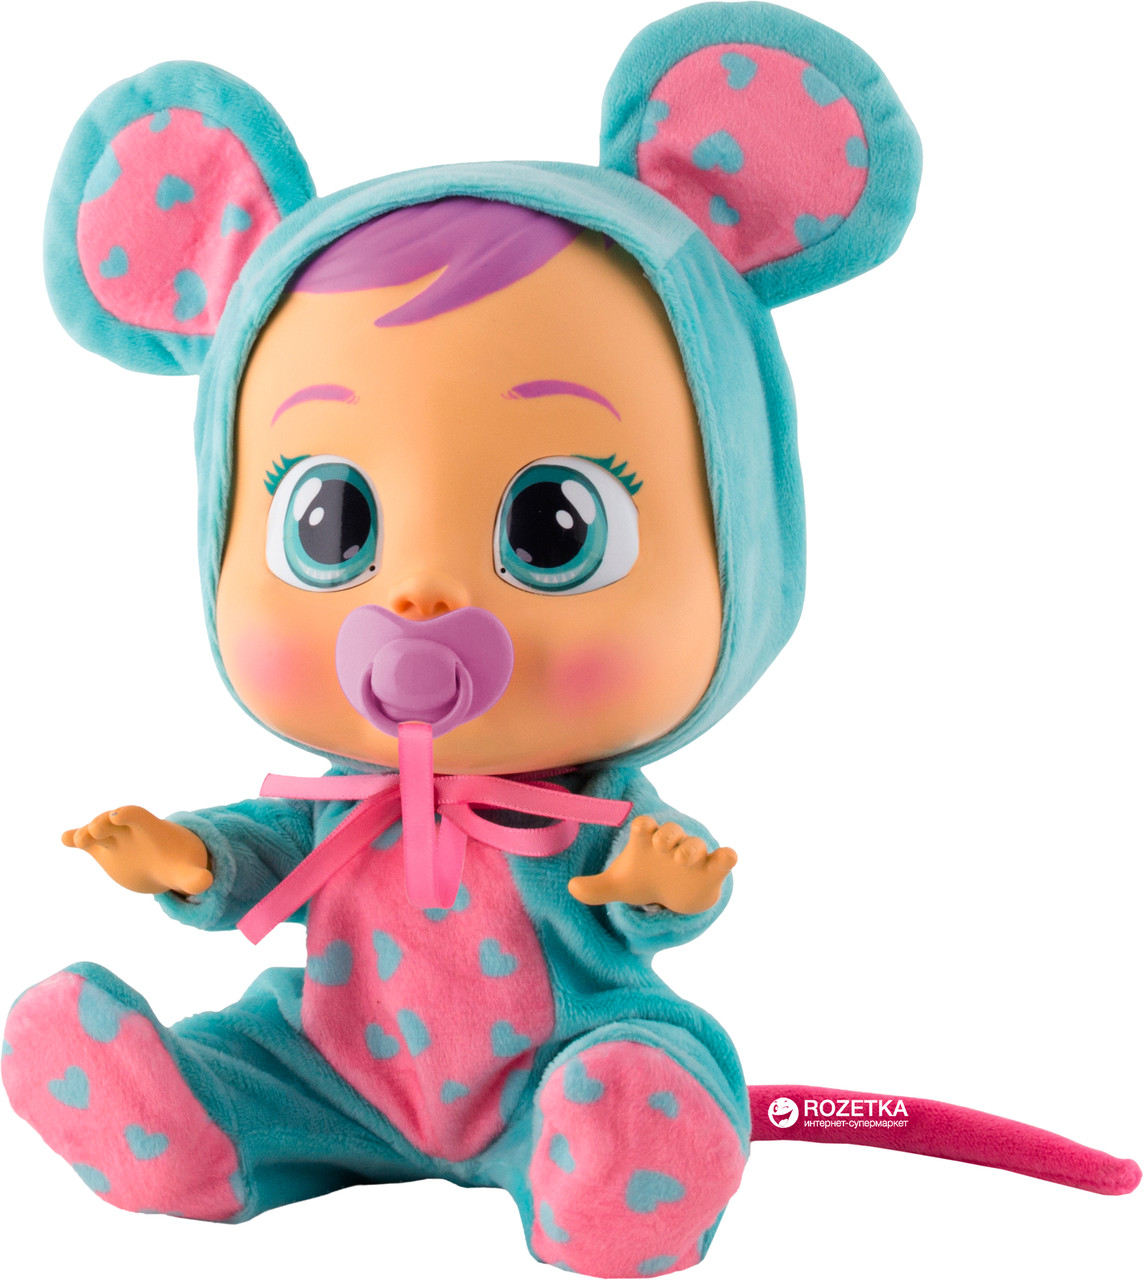 Іграшка Лялька IMC Toys Плакса Лала Мишка